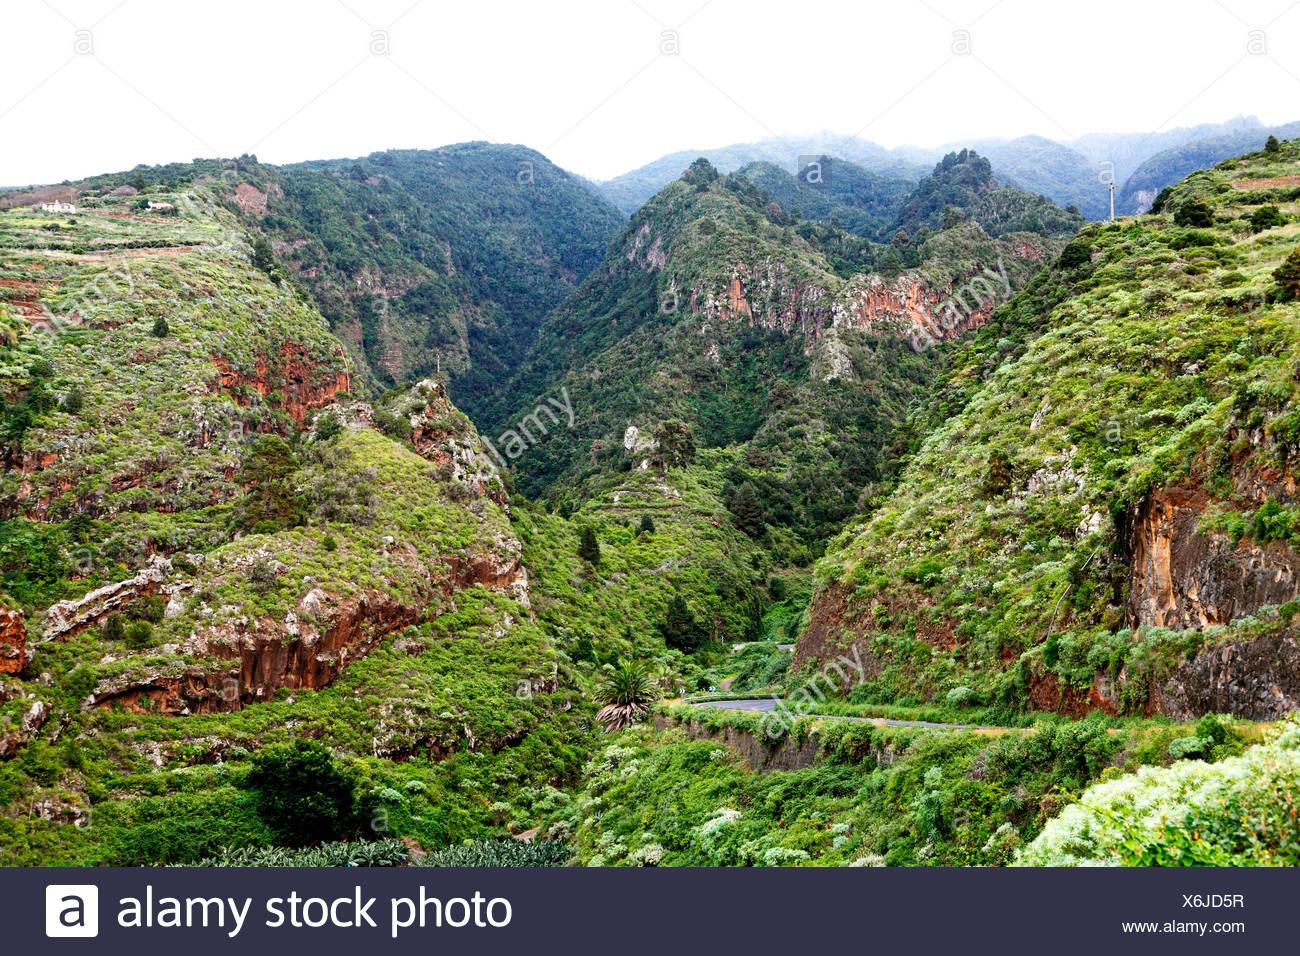 laurel forest in the mountains near La Galga, Canary Islands, La Palma Stock Photo